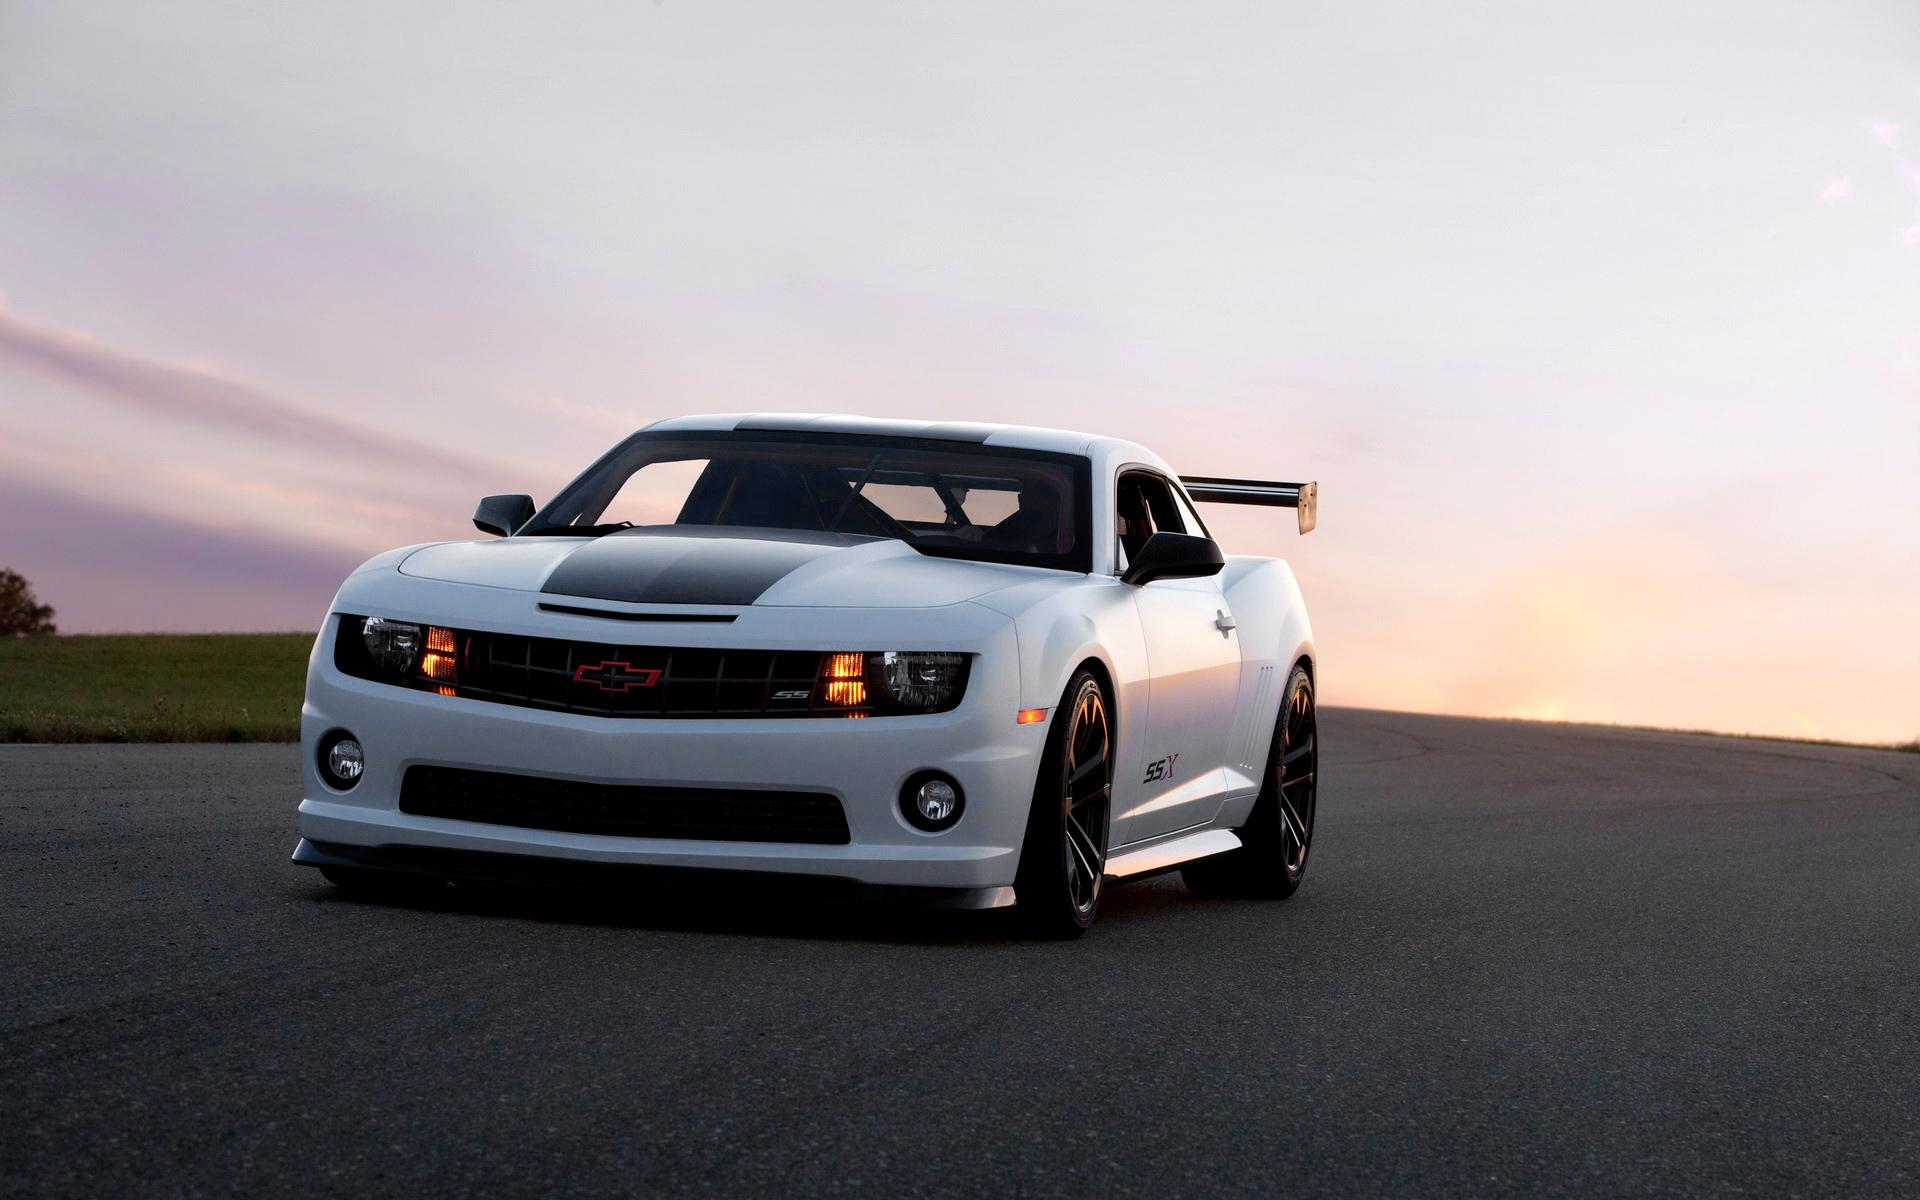 Chevrolet Camaro ssx Wide